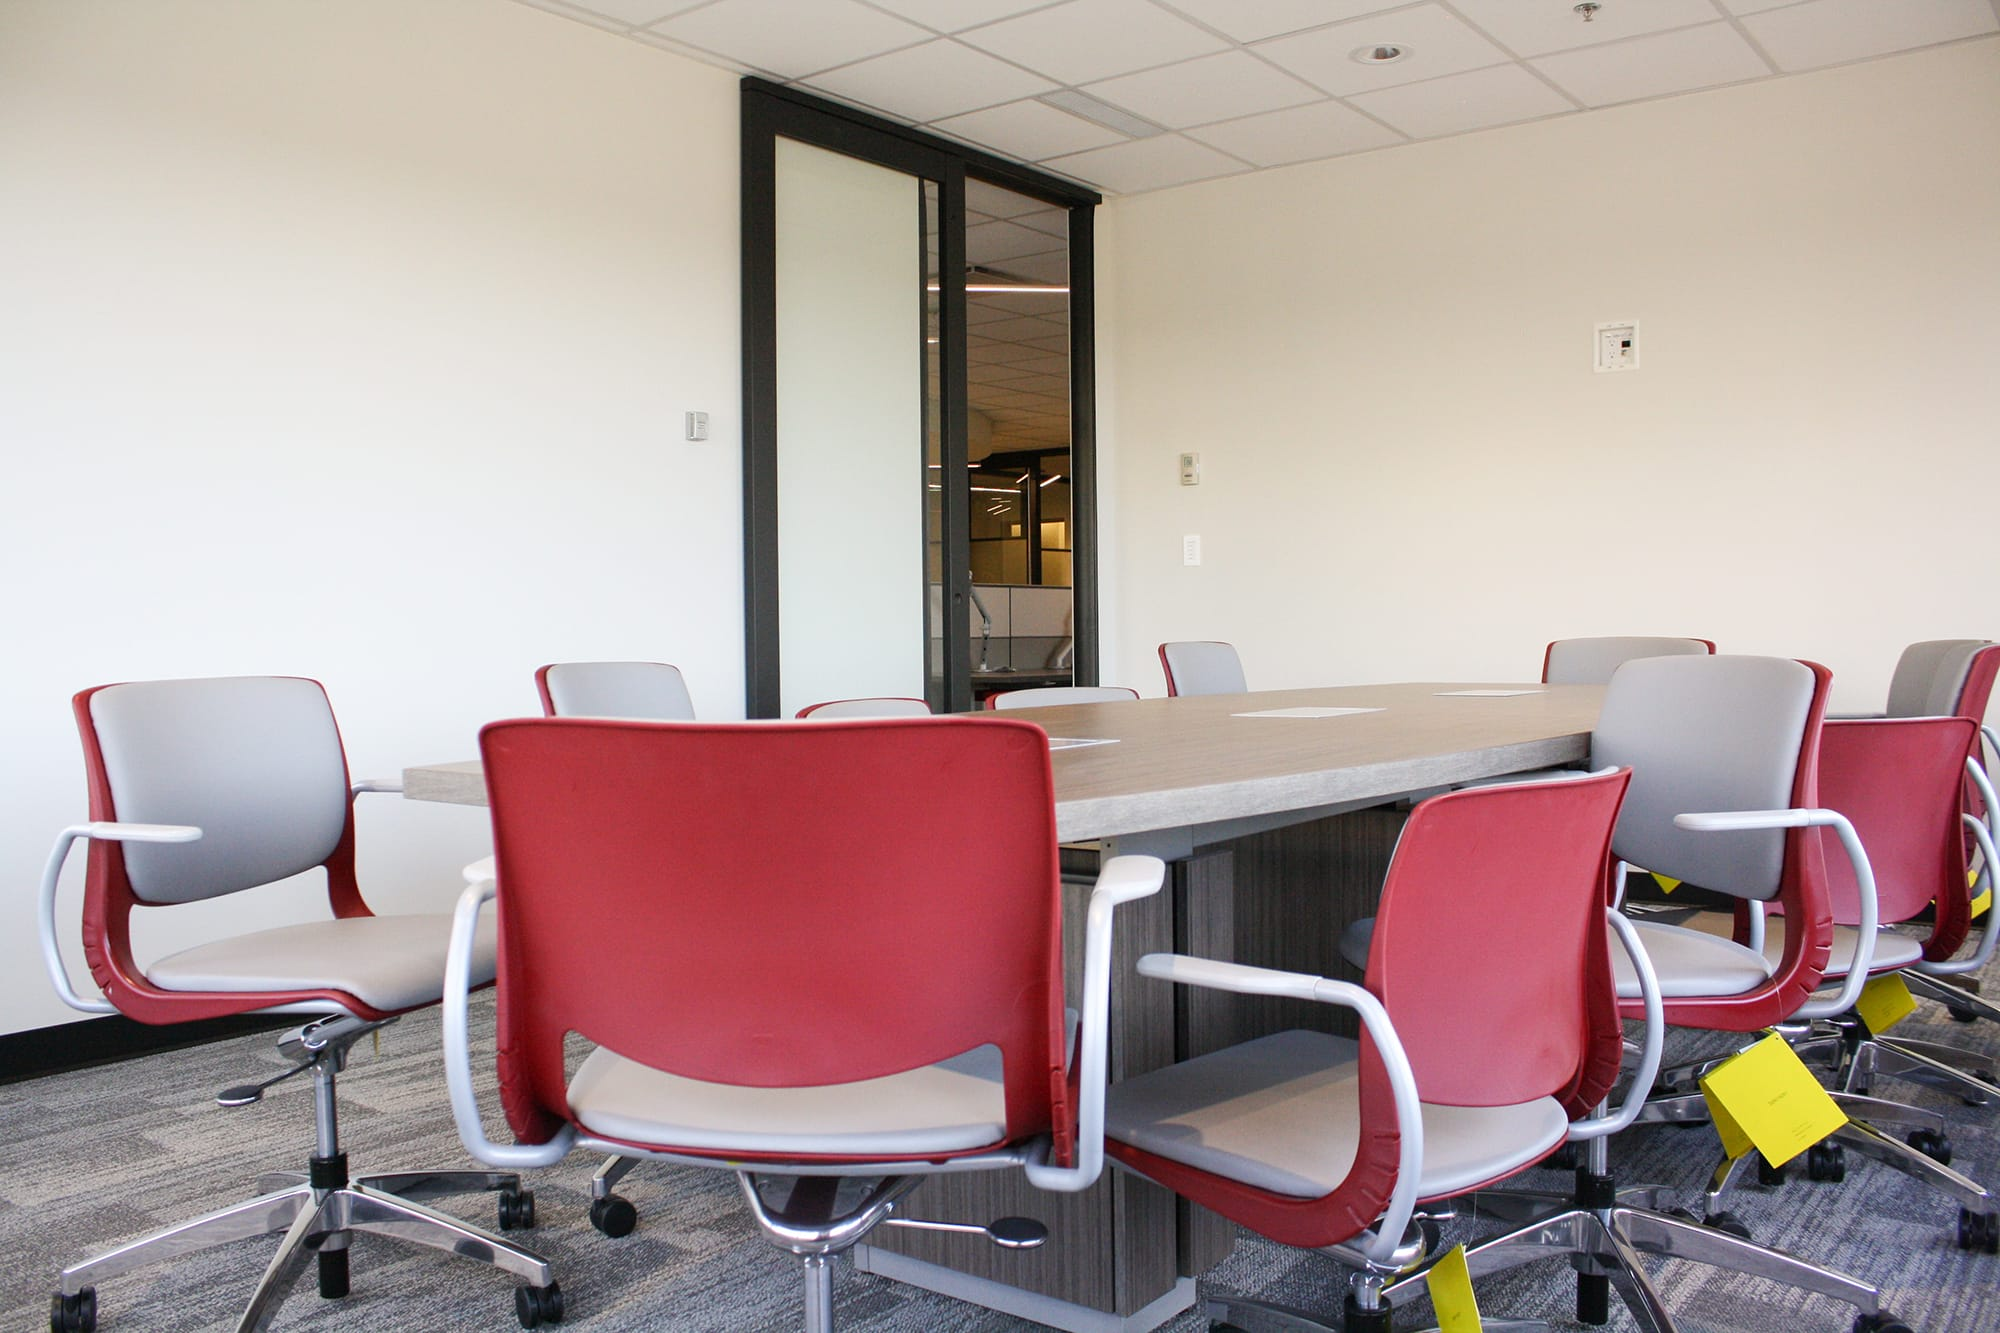 Edmonton Public School Board office interior meeting room